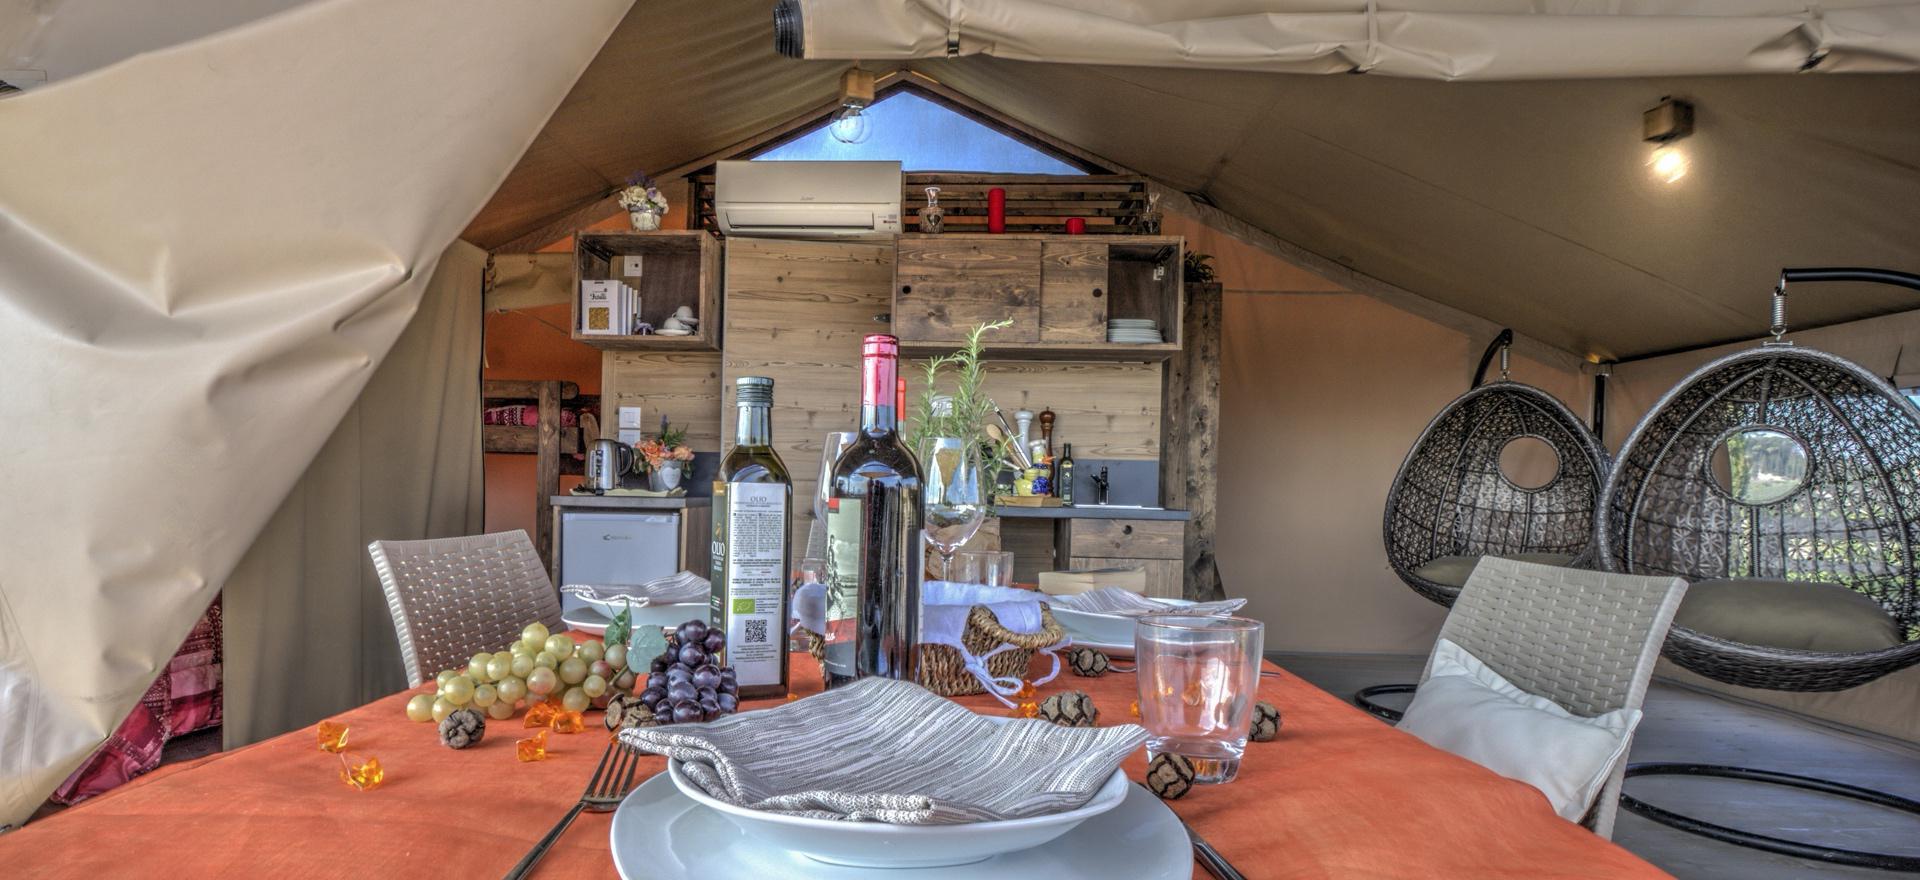 Familievriendelijke glamping in Toscane